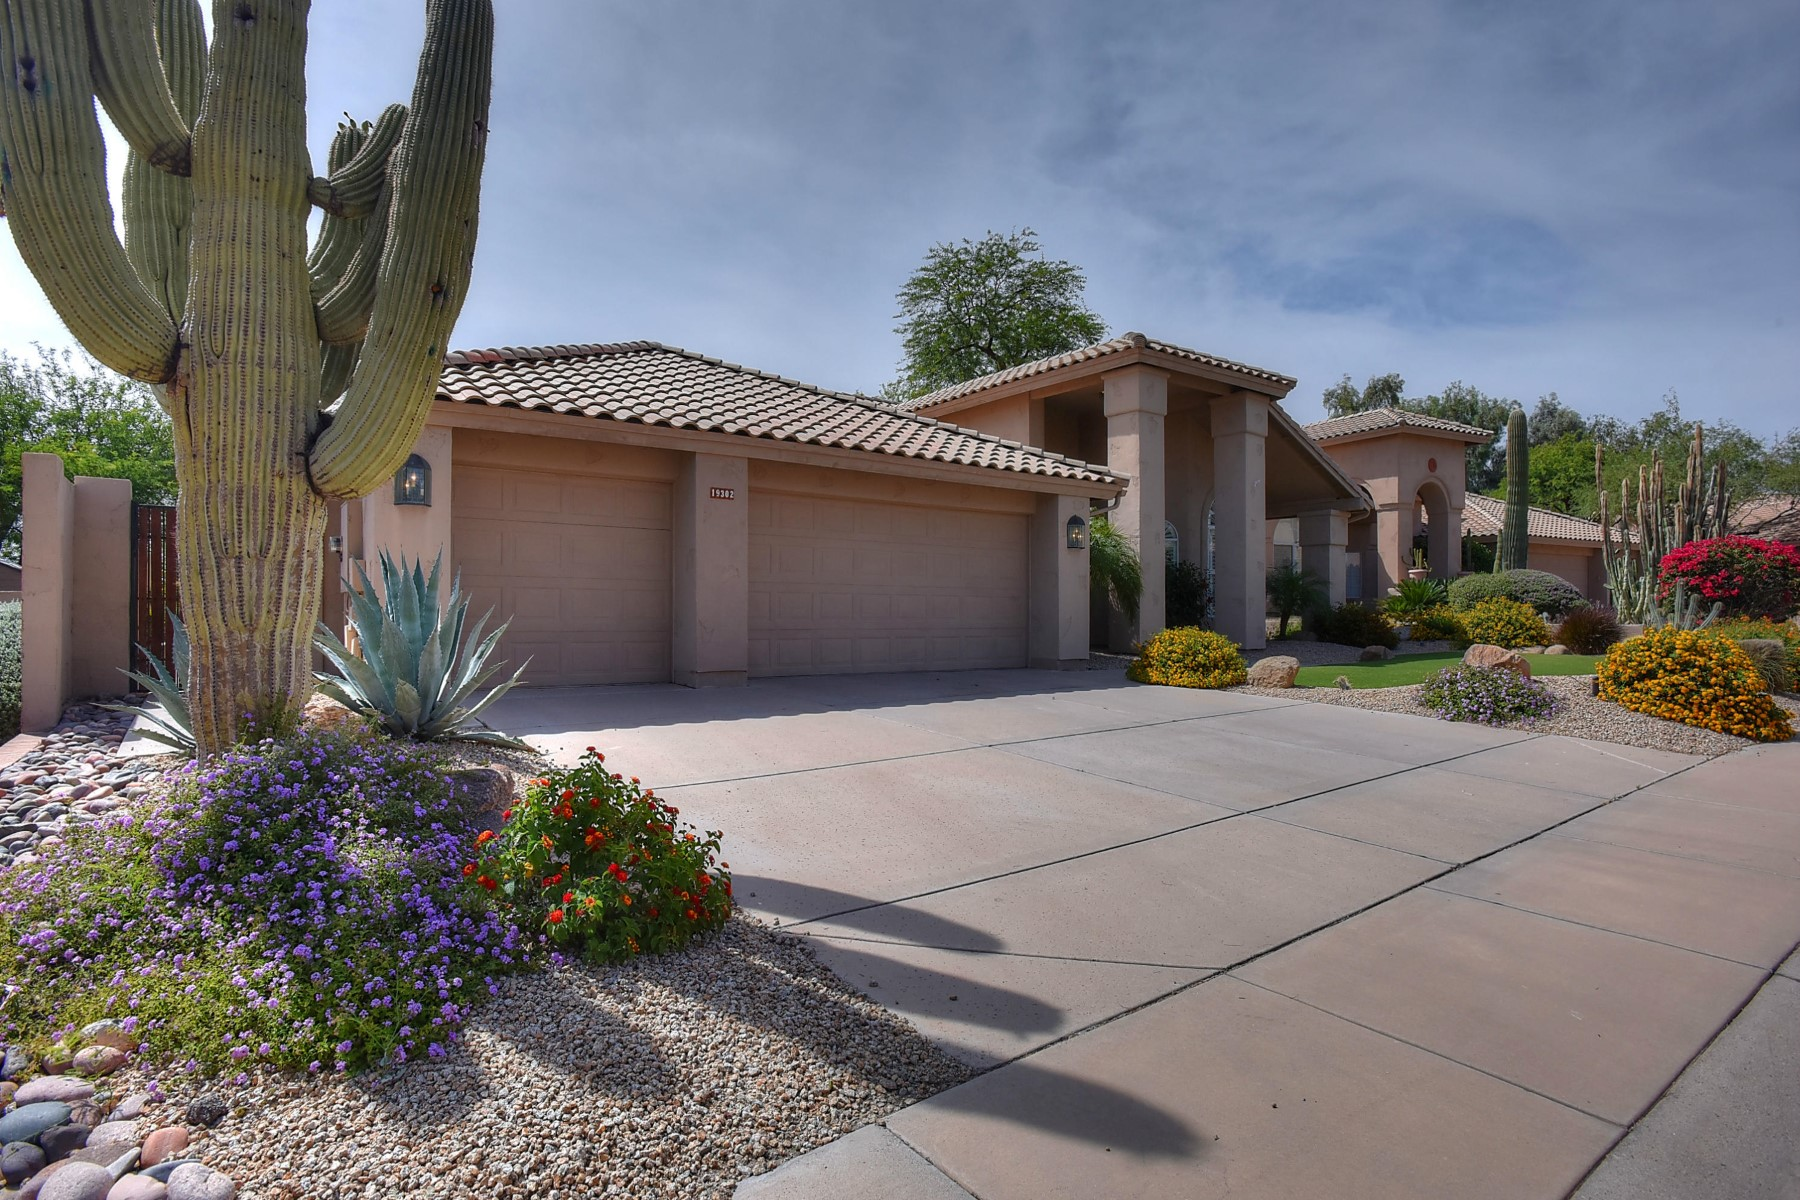 Tek Ailelik Ev için Satış at Immaculately maintained home in The Estates at Ironwood Village 19302 N 88TH WAY Scottsdale, Arizona 85255 Amerika Birleşik Devletleri